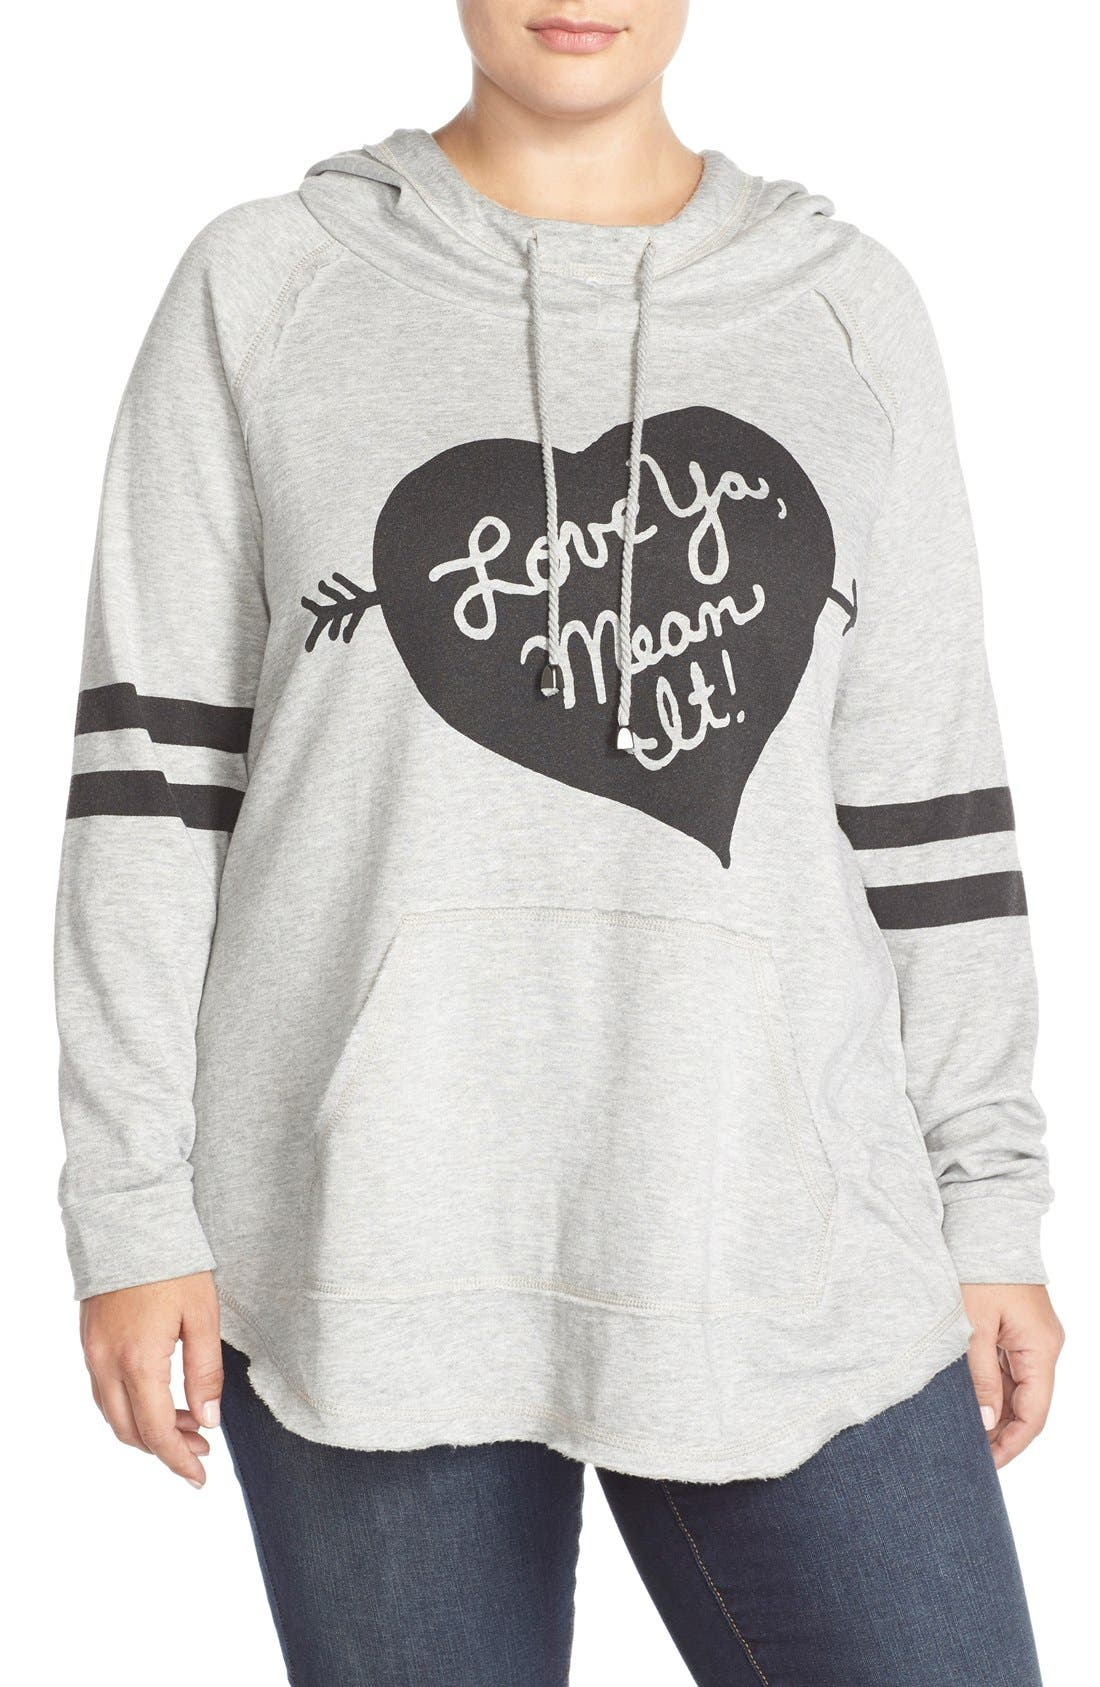 'Love Ya, Mean It' Hooded Sweatshirt,                         Main,                         color,